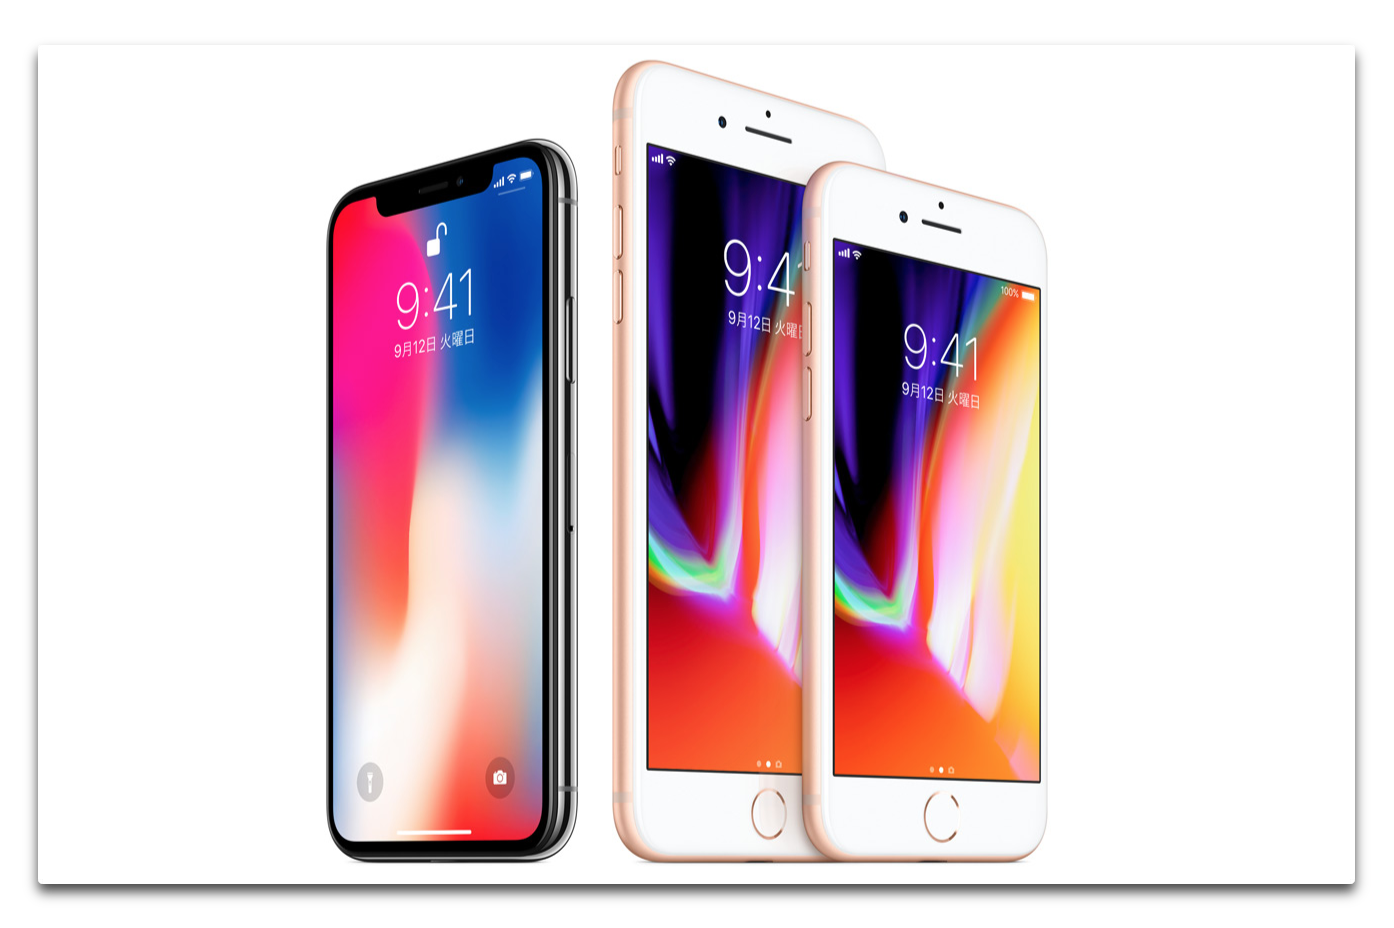 AppleのiPhone Xは、2018年第1四半期に世界でベストセラーモデル